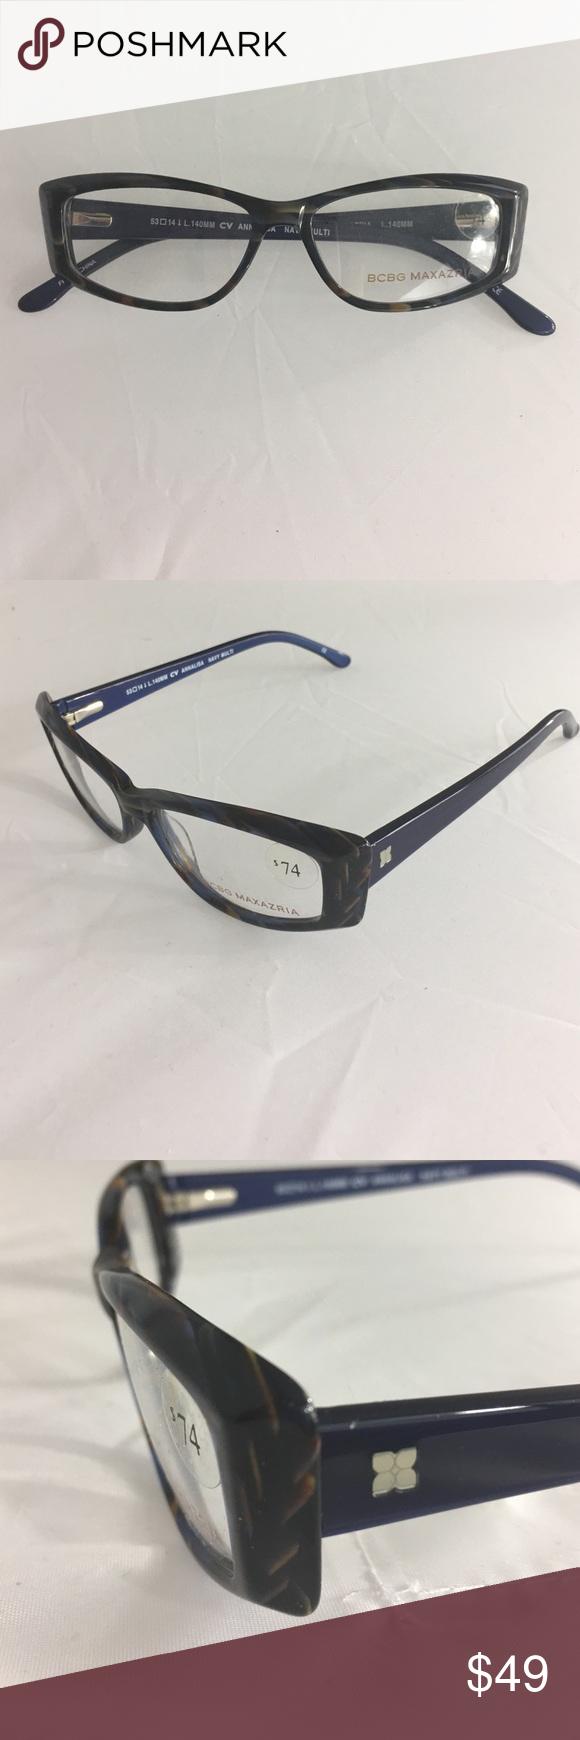 Brand NEW BCBG MAXAZRIA Women\'s Eyeglass Frames Boutique | My Posh ...